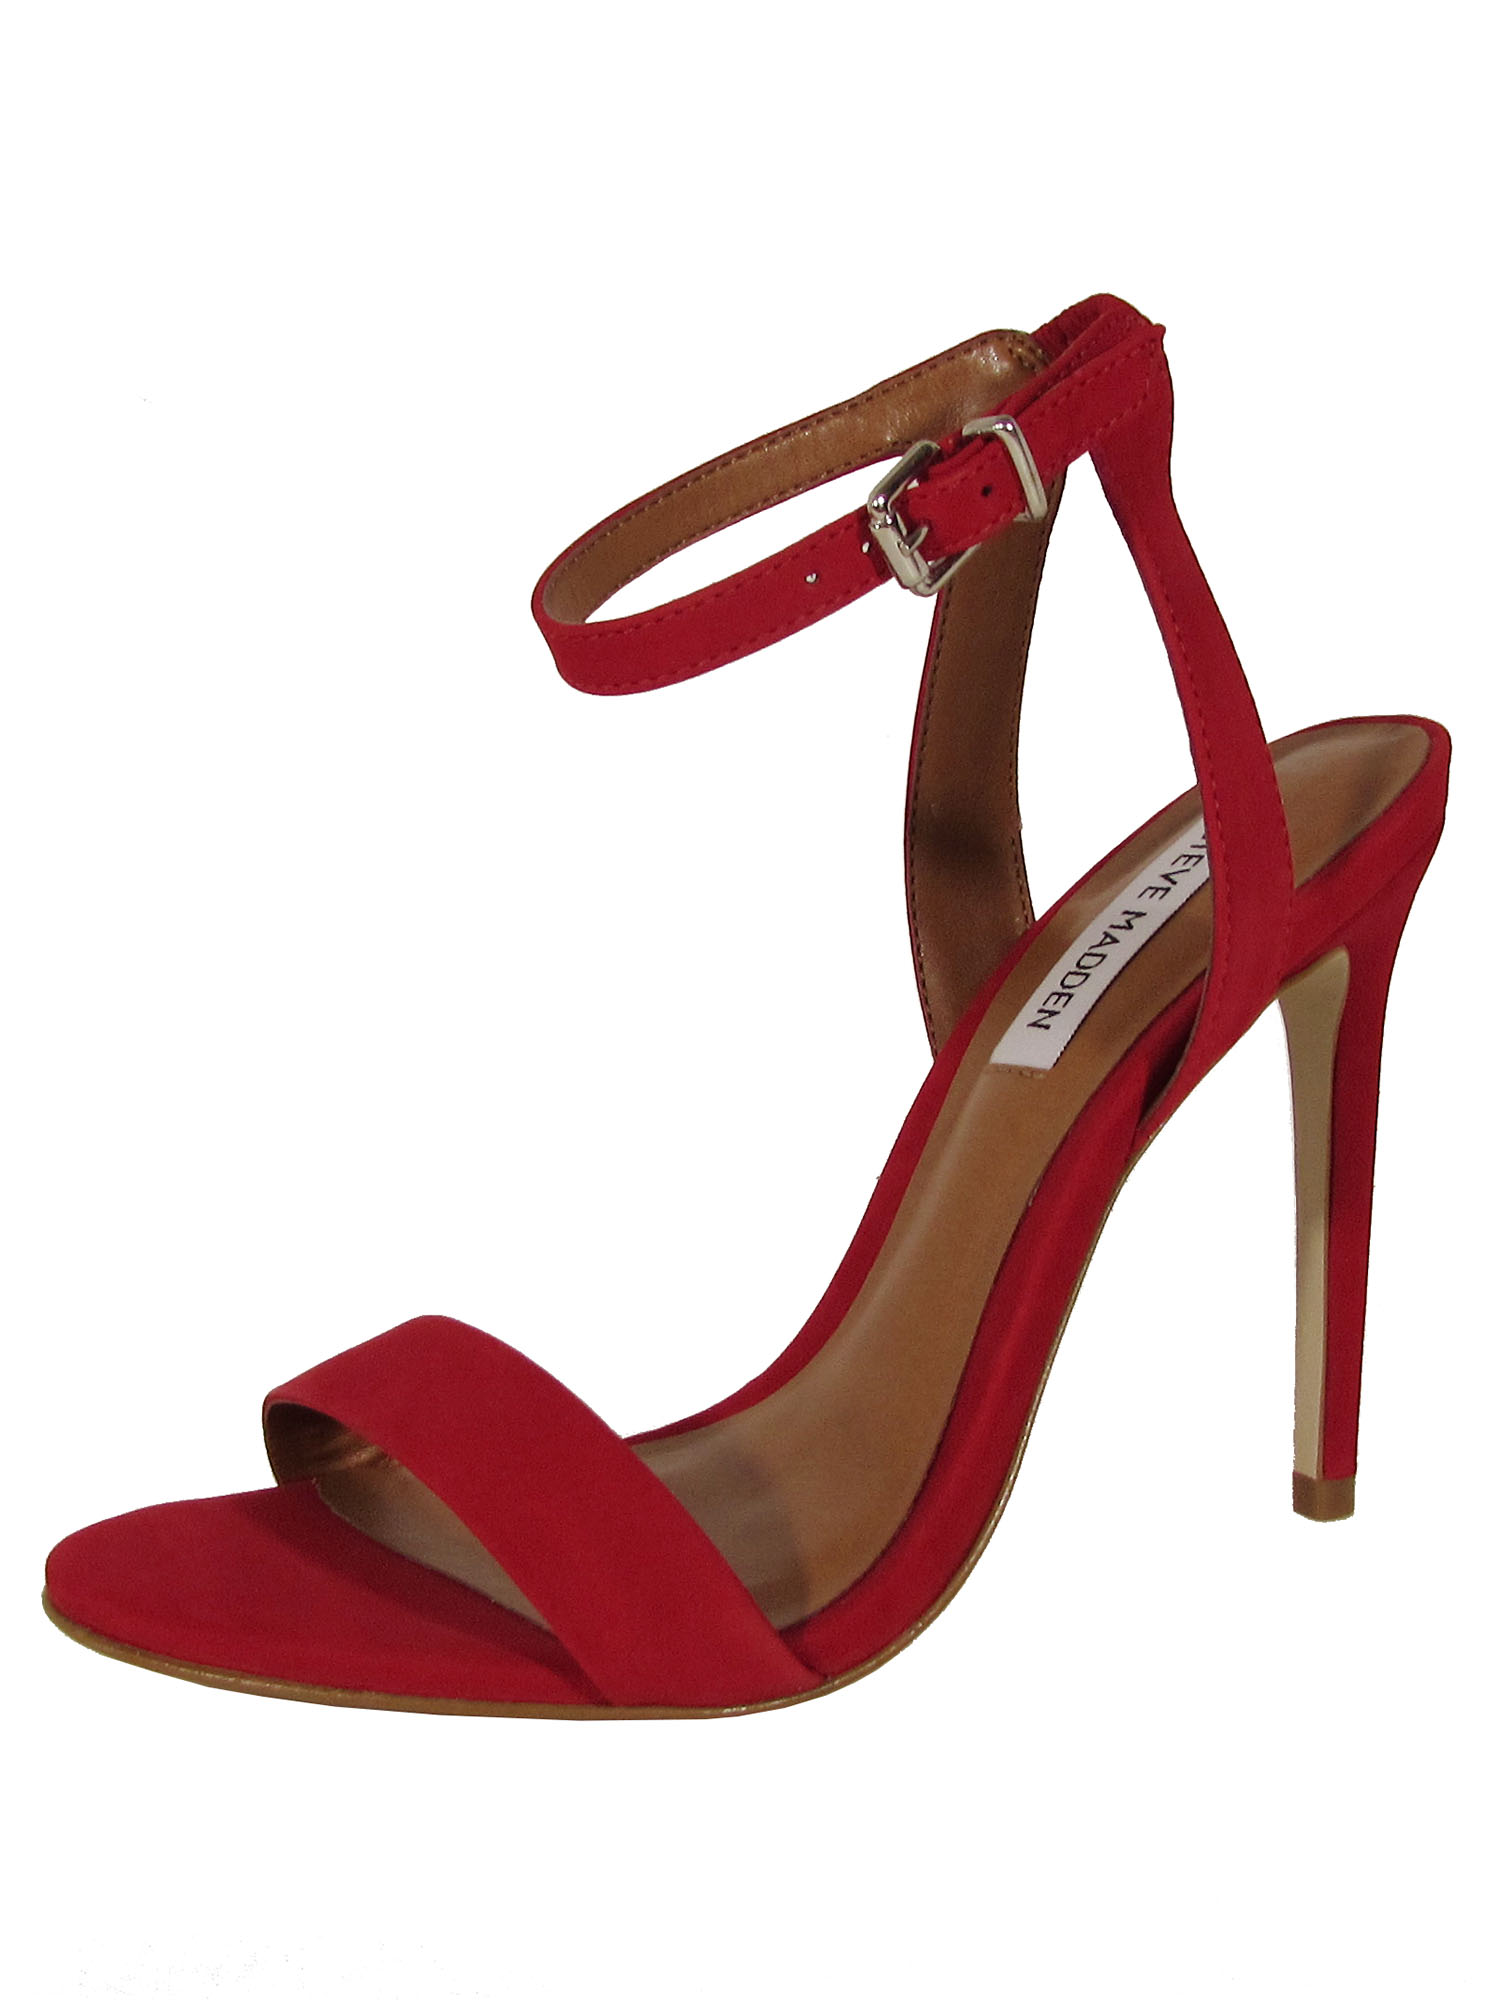 Steve Madden Damenschuhe Landen Stiletto Open Toe Sandale Schuhes